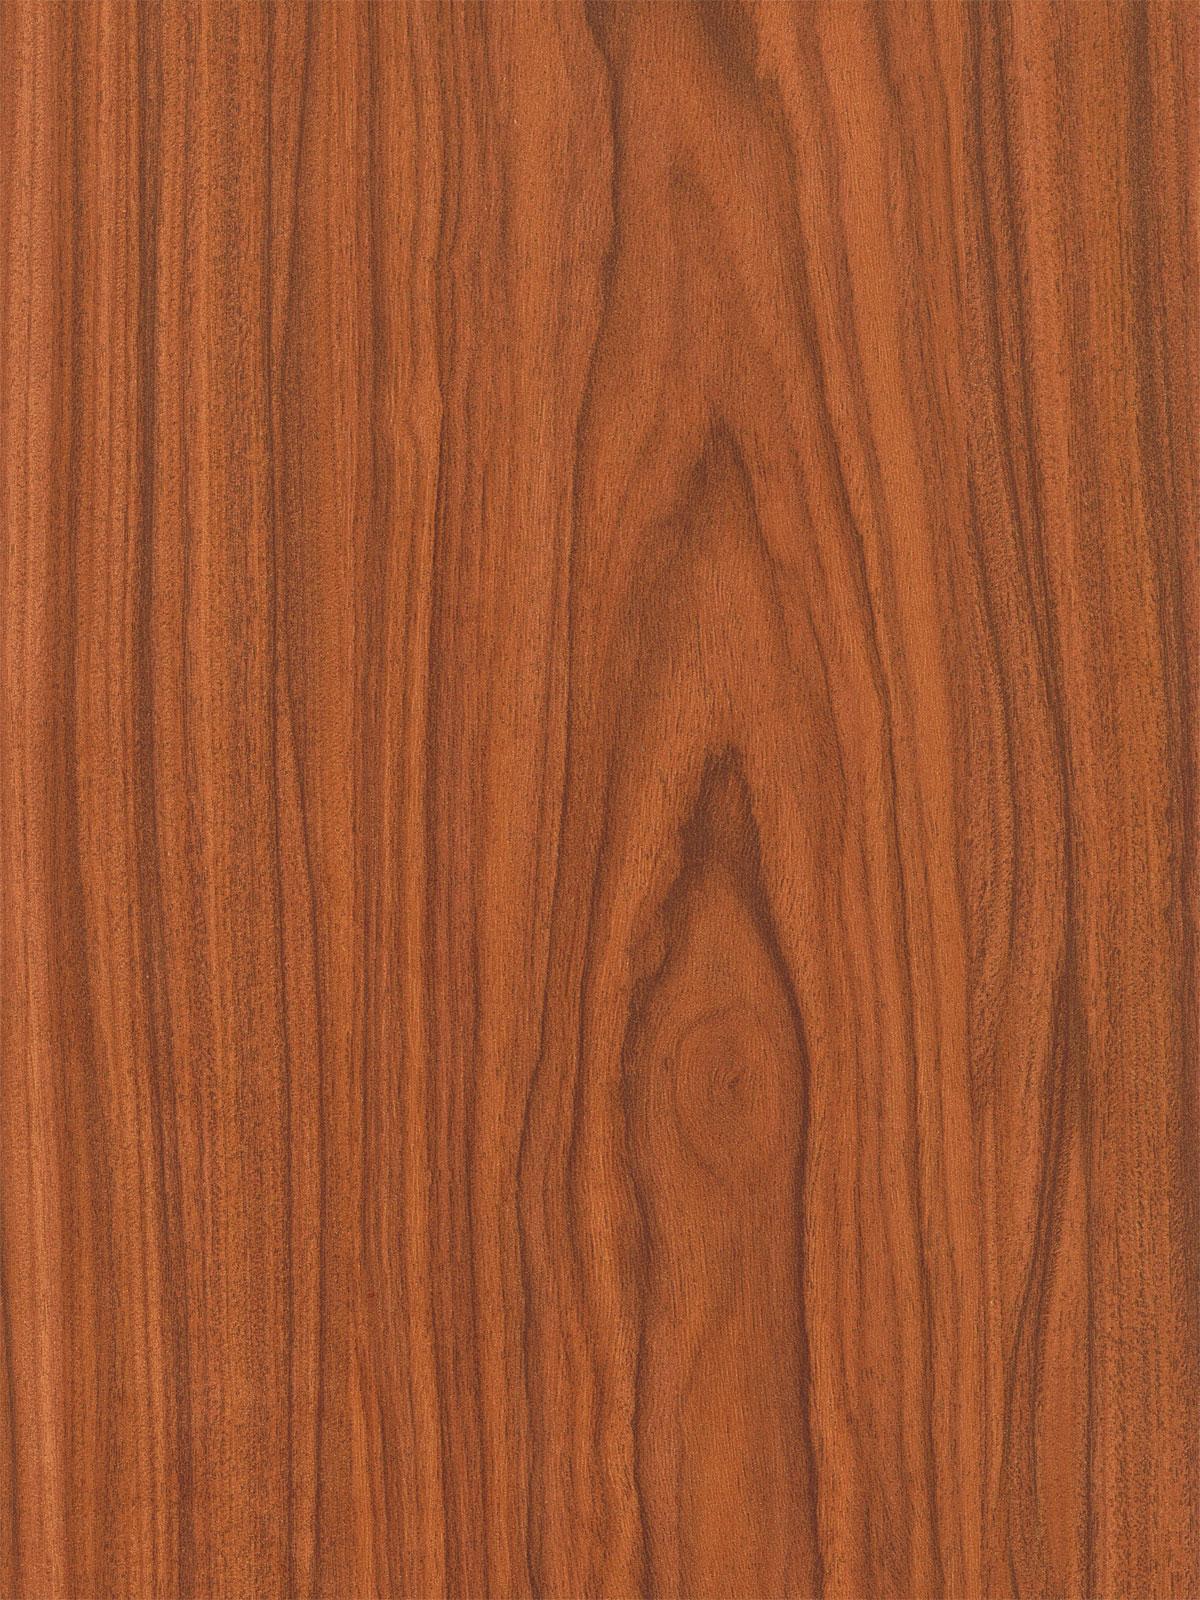 Welcome to china laminate flooring manufacturer of for Laminate flooring manufacturers